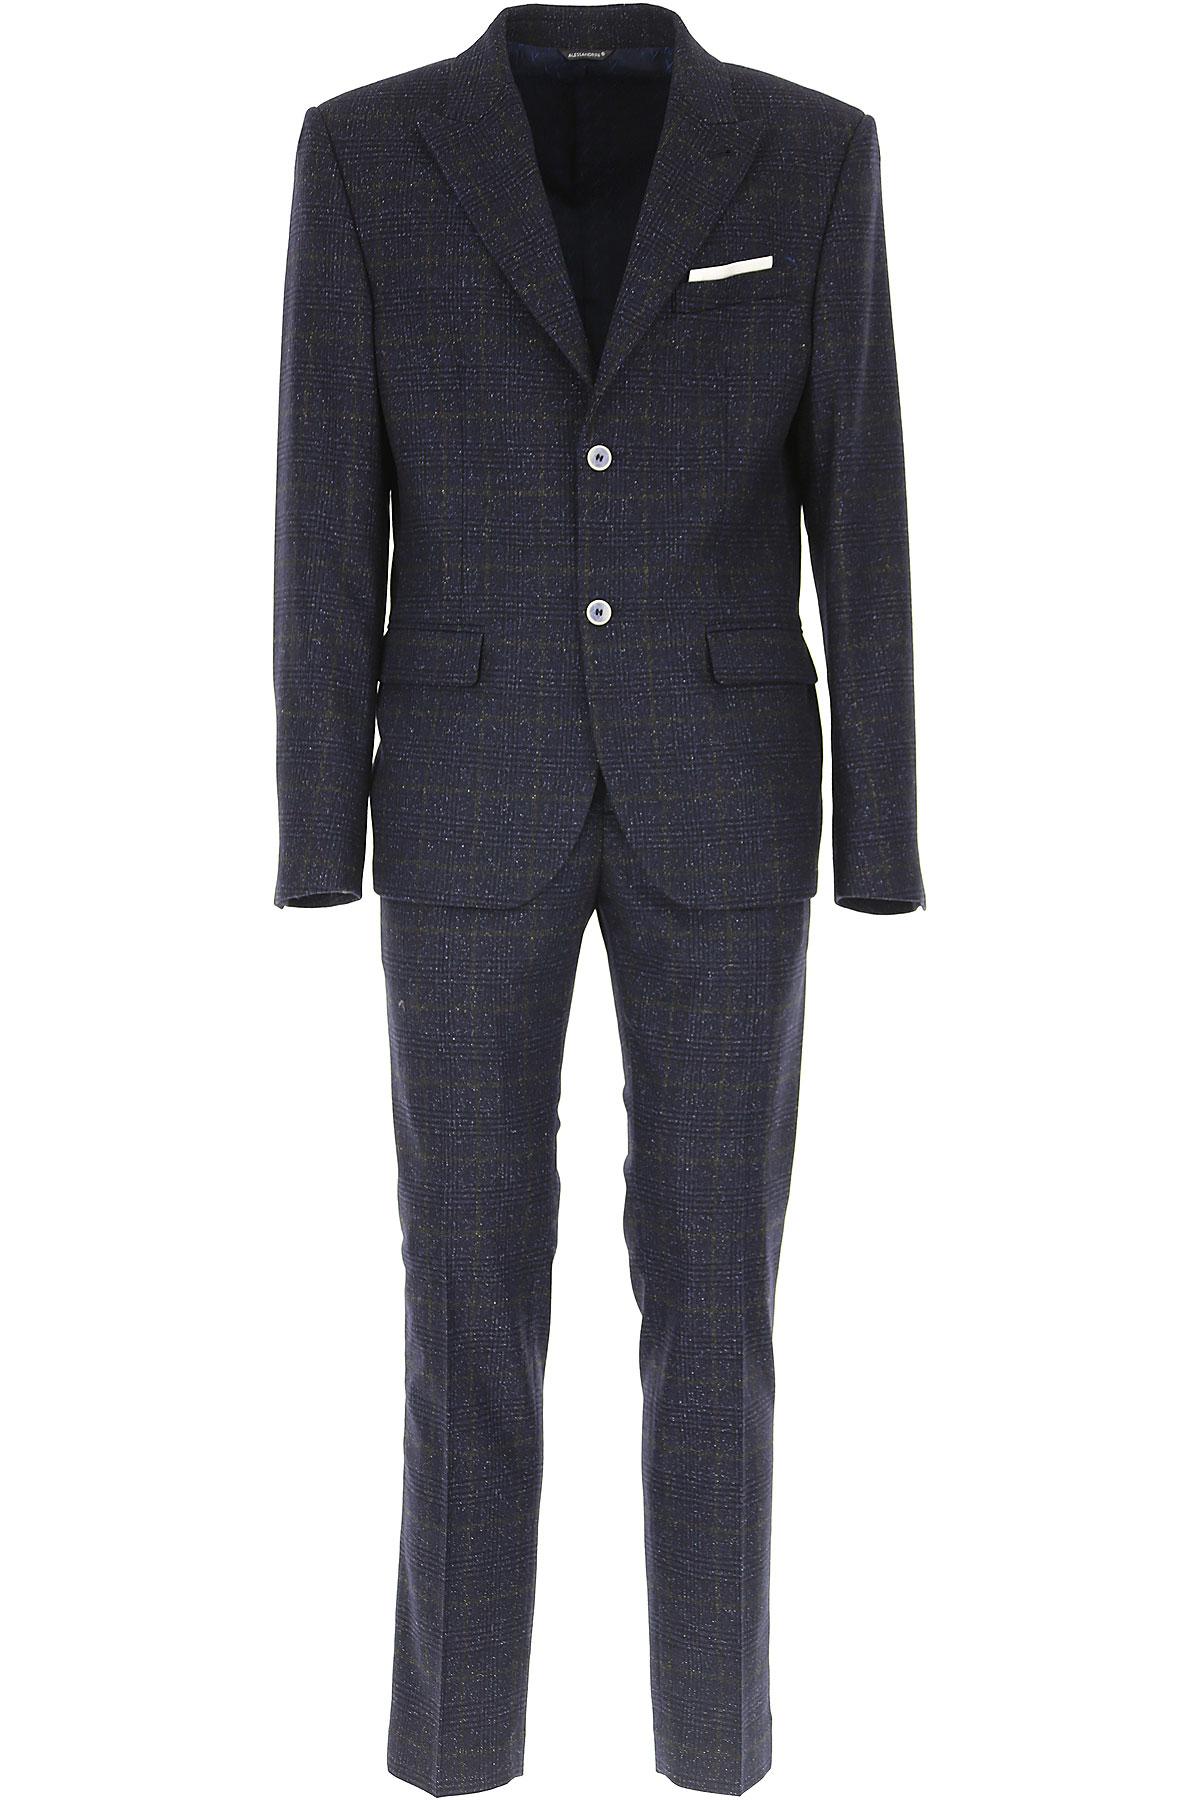 Image of Daniele Alessandrini Men's Suit, Dark Blue, Wool, 2017, L M XL